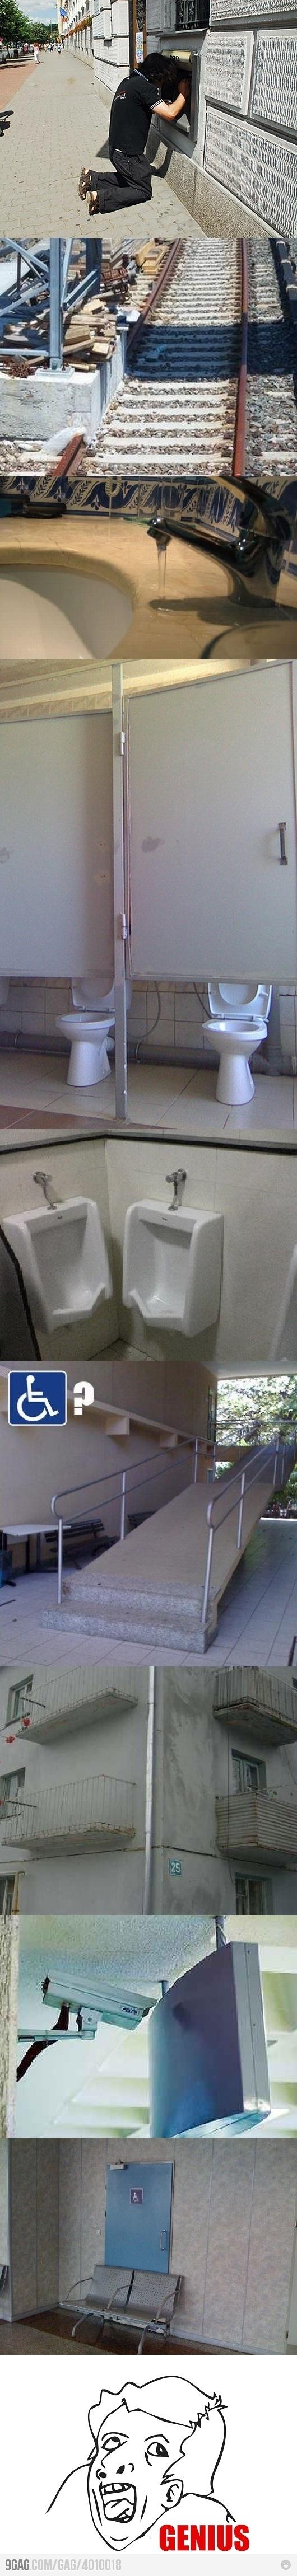 People are geniuses!